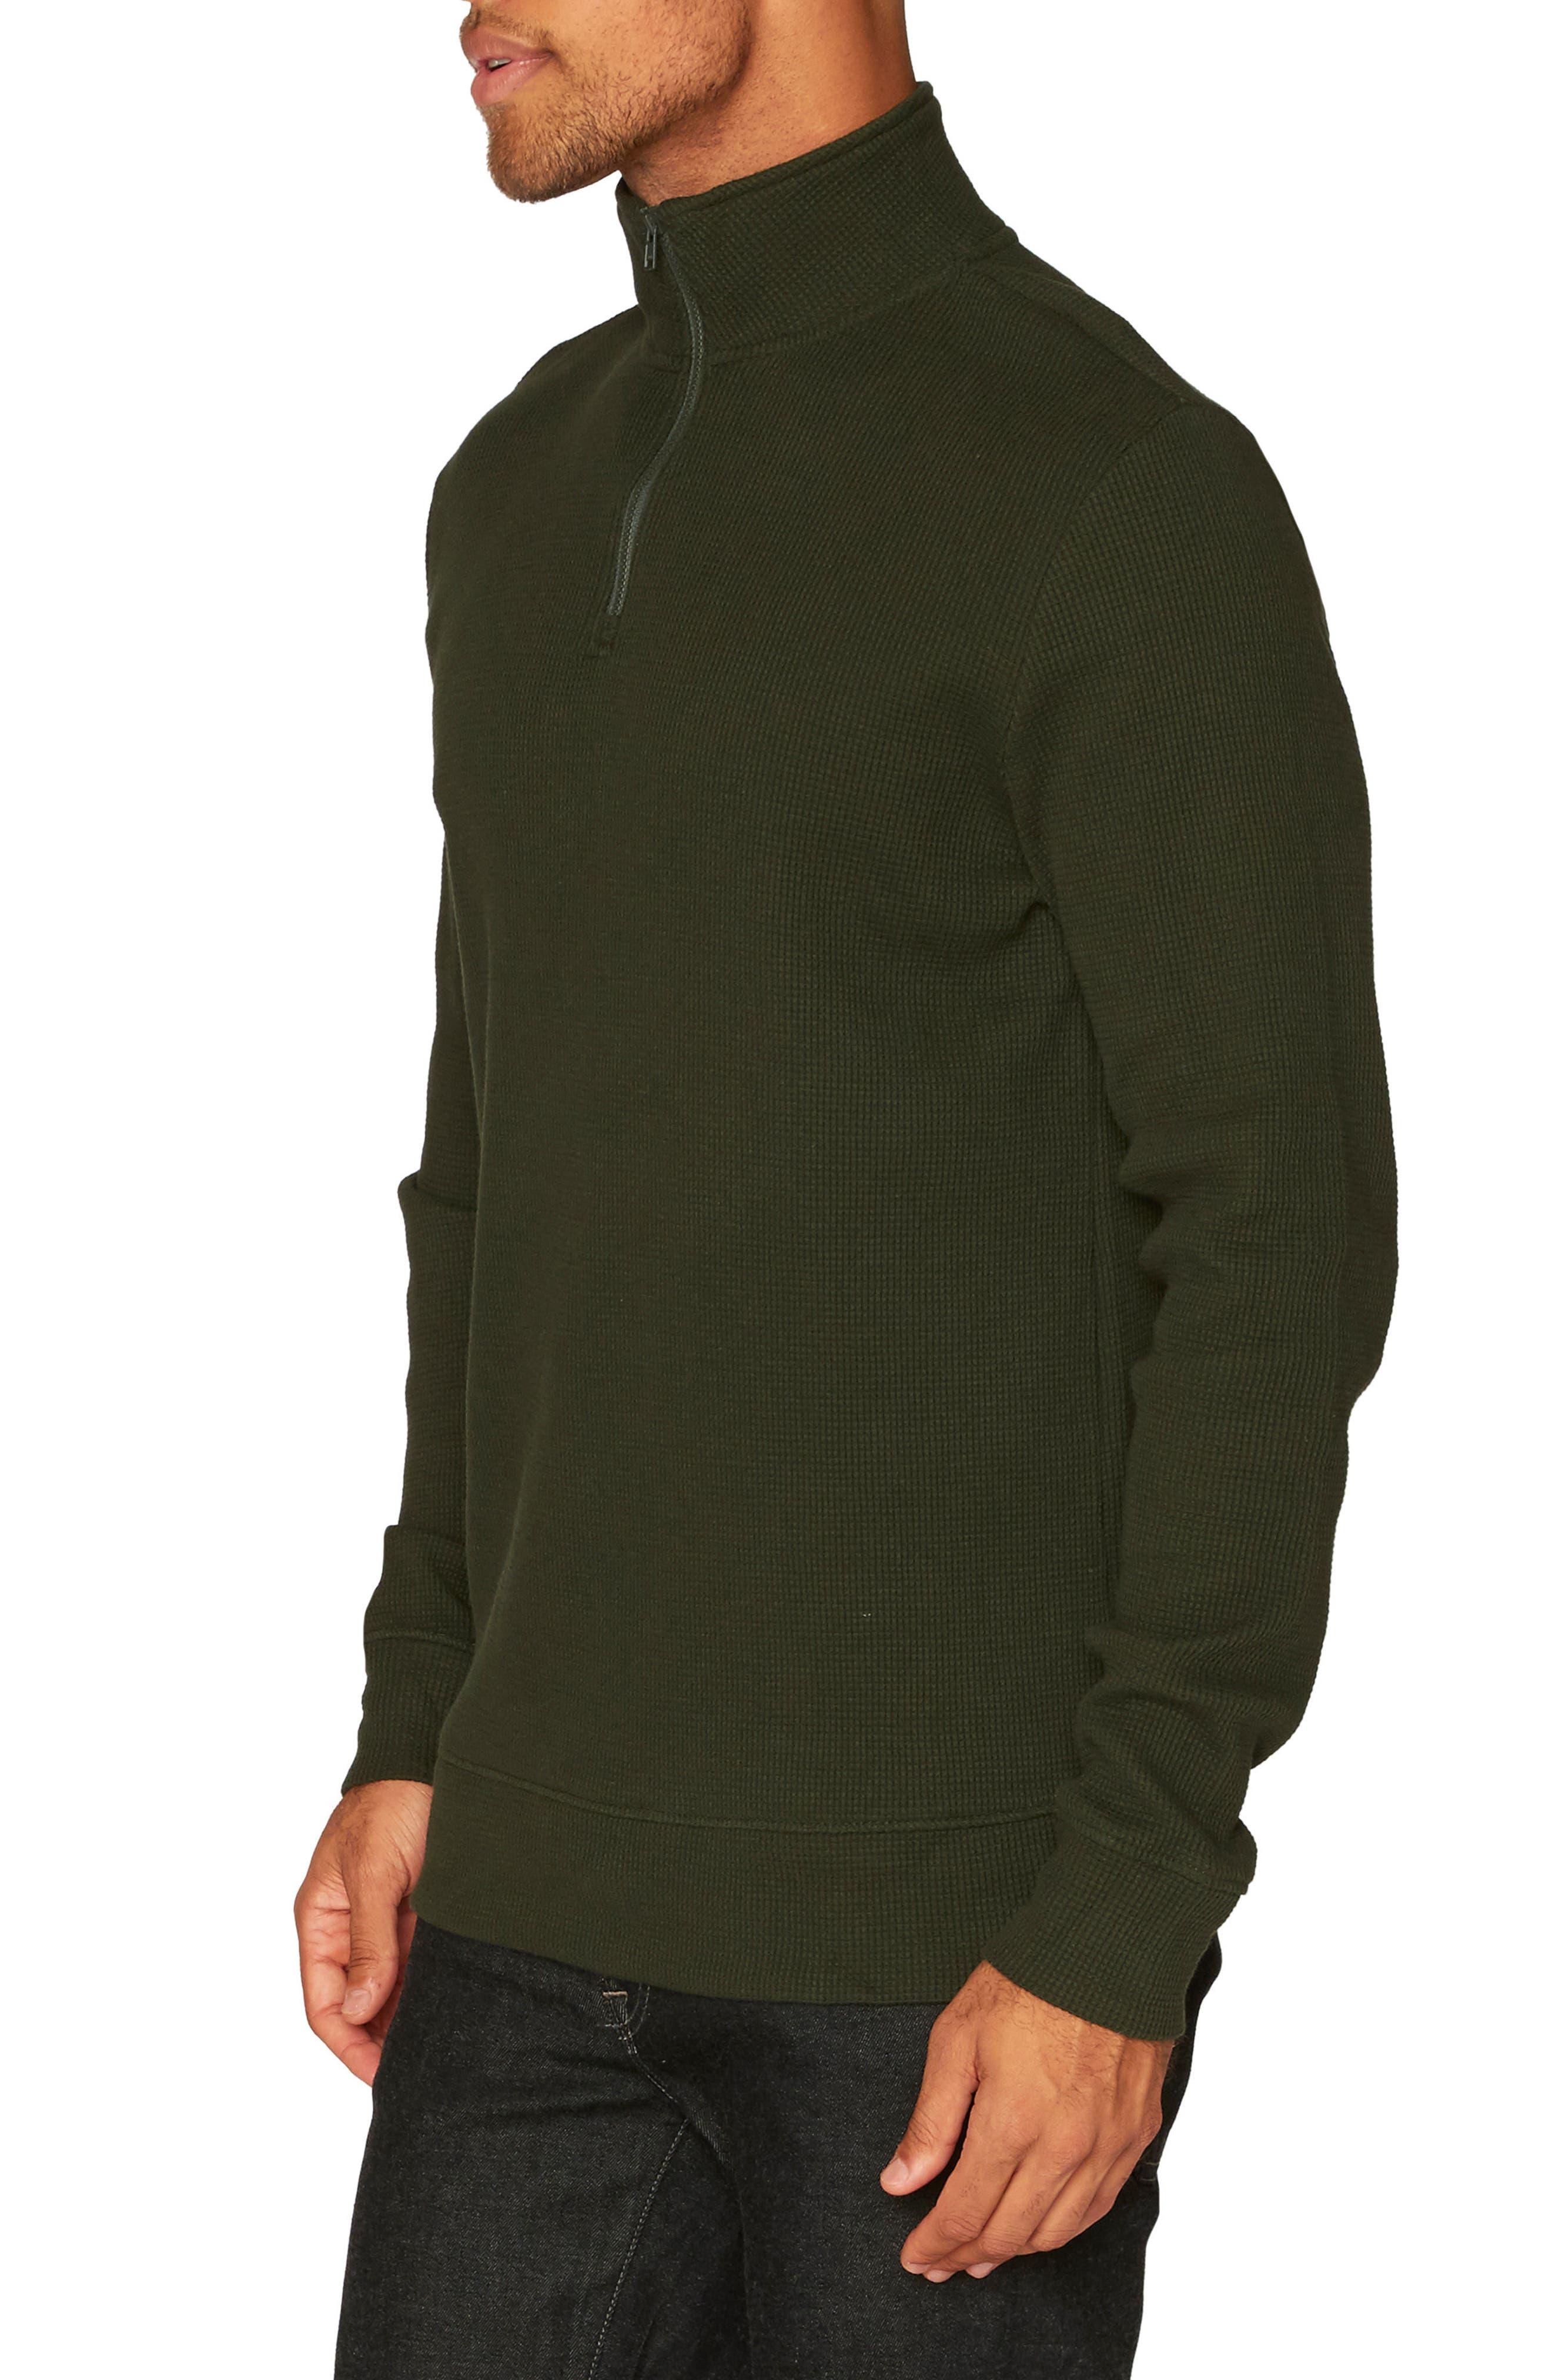 Chad Half Zip Thermal Pullover,                             Alternate thumbnail 3, color,                             Rosin